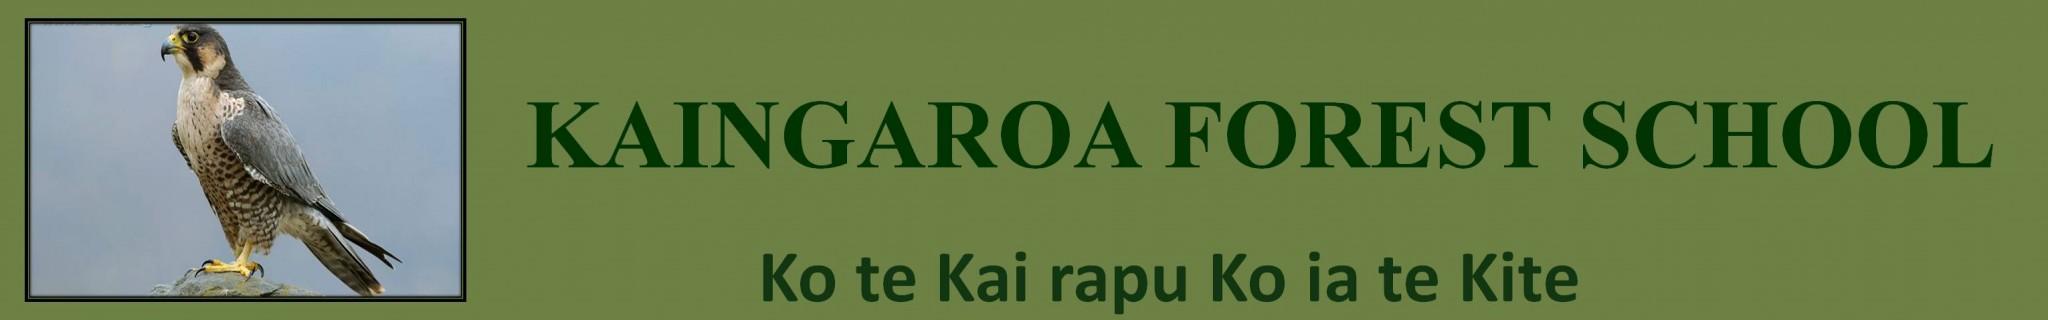 Kaingaroa Forest School Logo